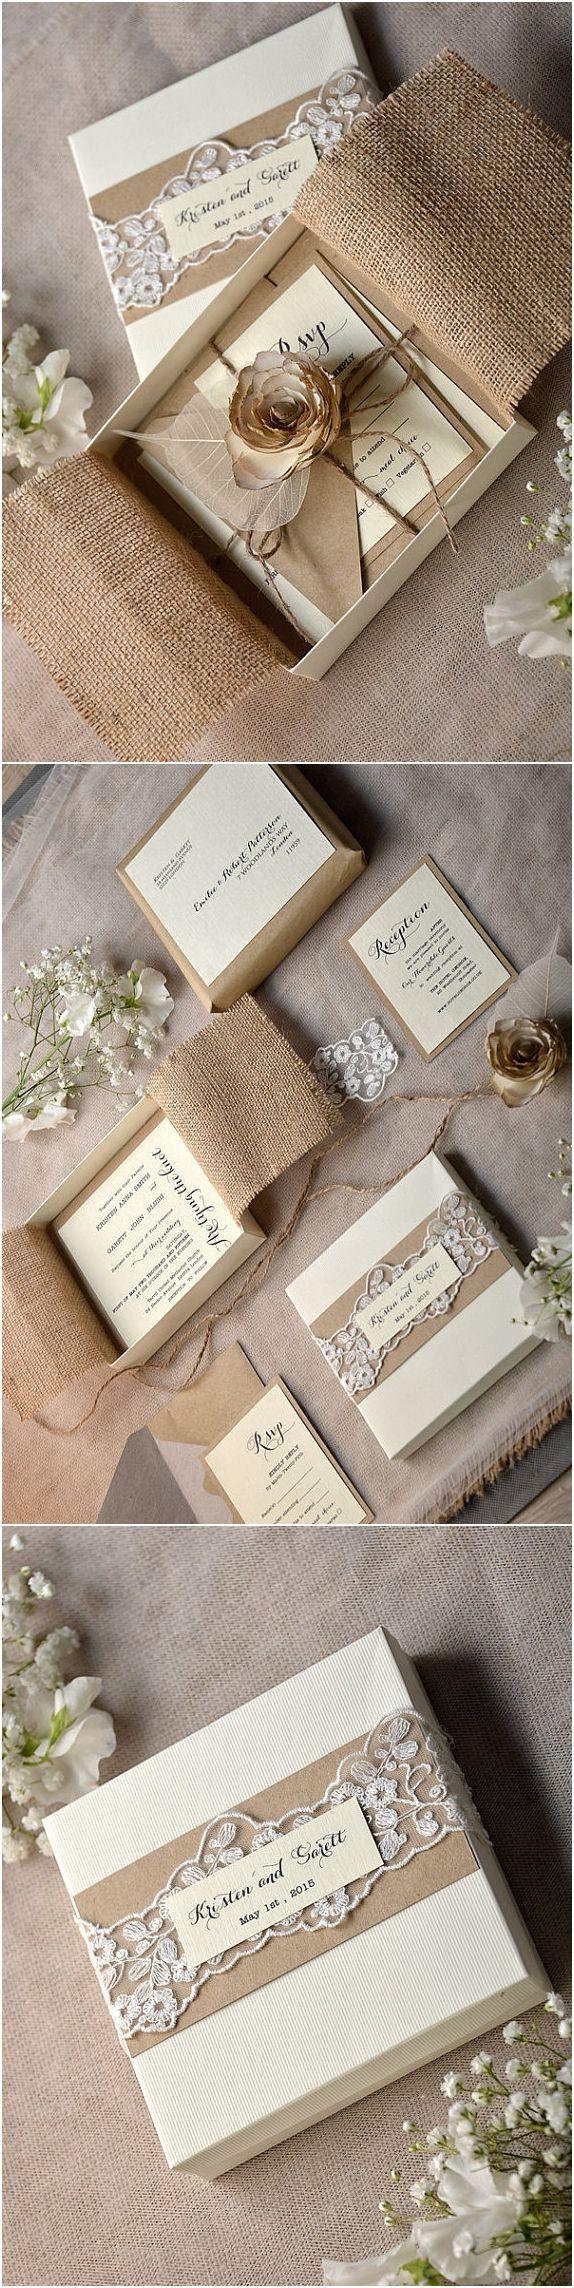 Rustic country burlap wedding invitations kits @4LOVEPolkaDots